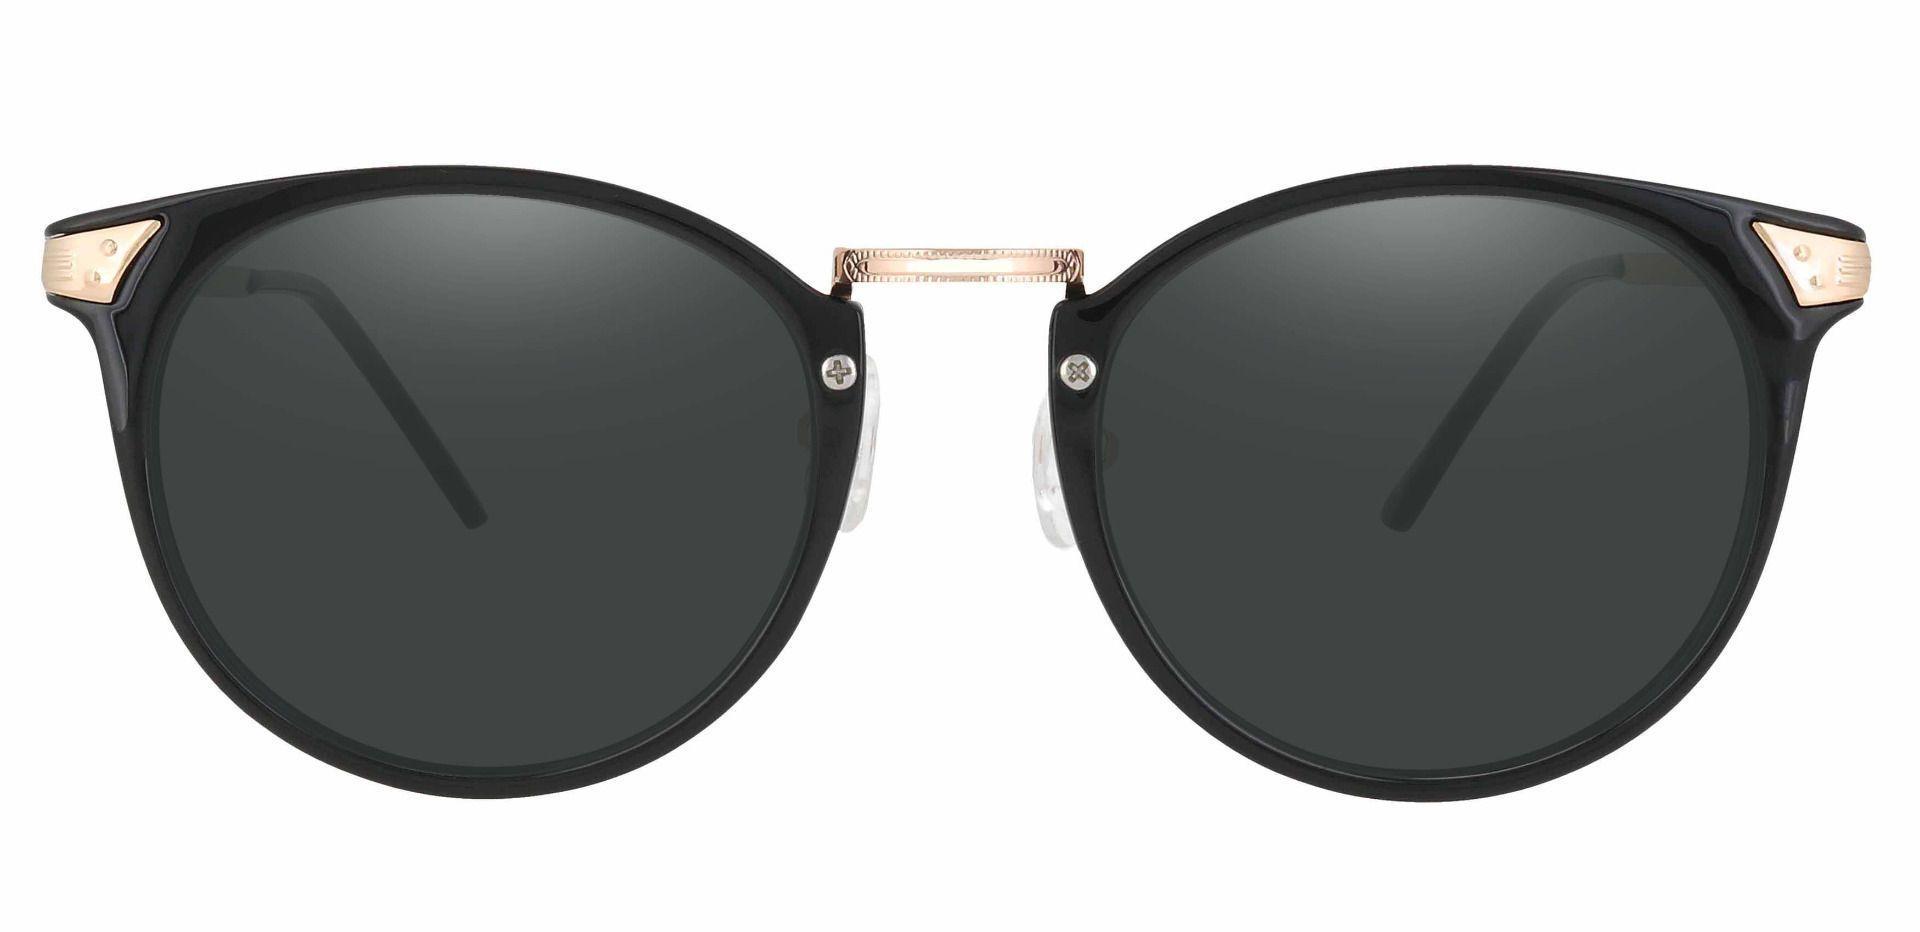 Blackwell Round Prescription Sunglasses - Black Frame With Gray Lenses